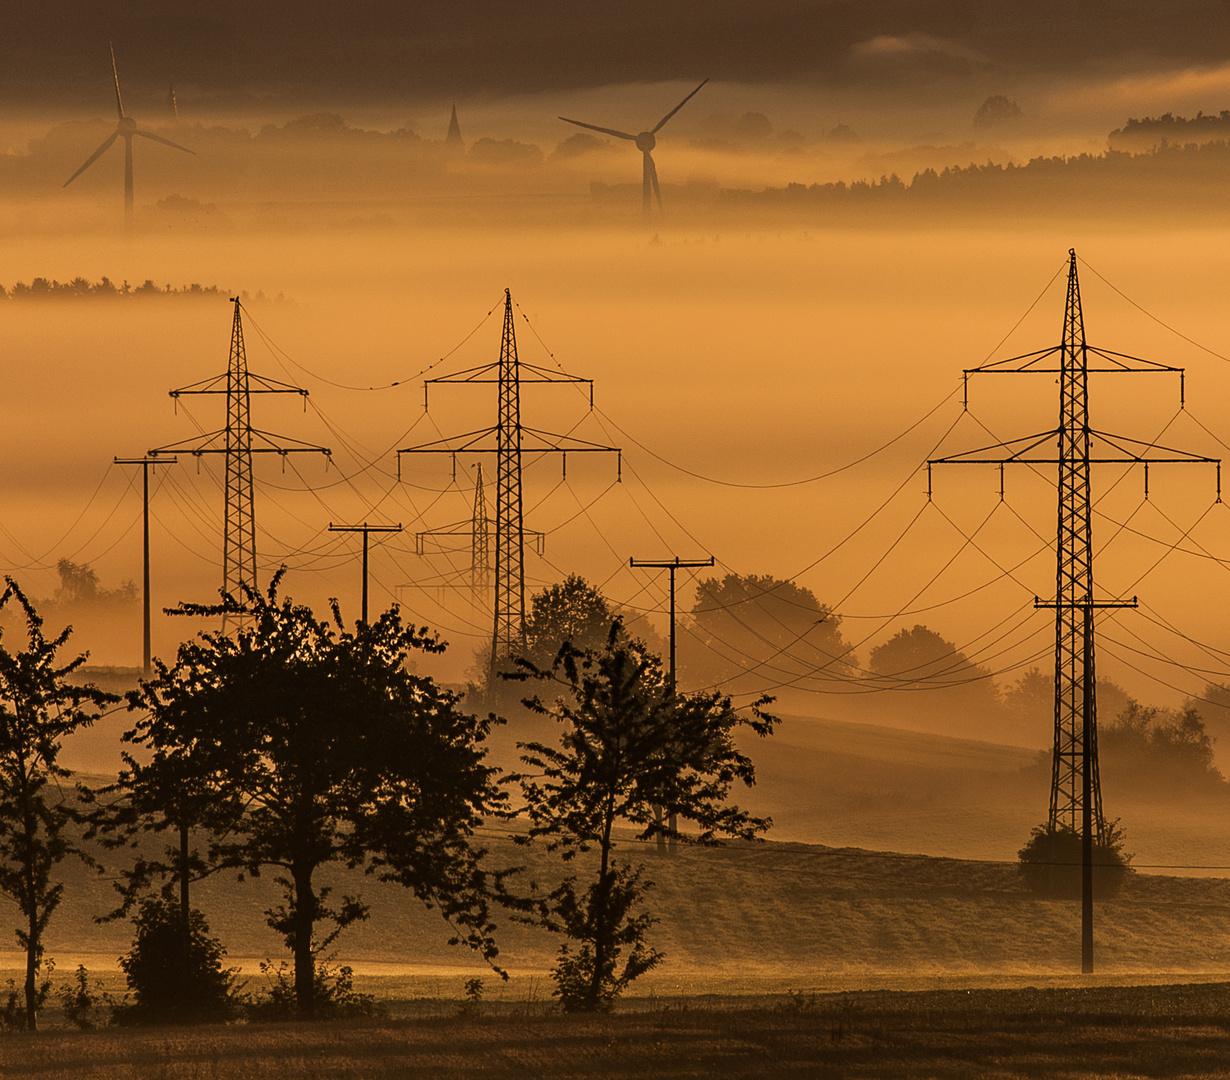 Industrielandschaft im Sonnenaufgang